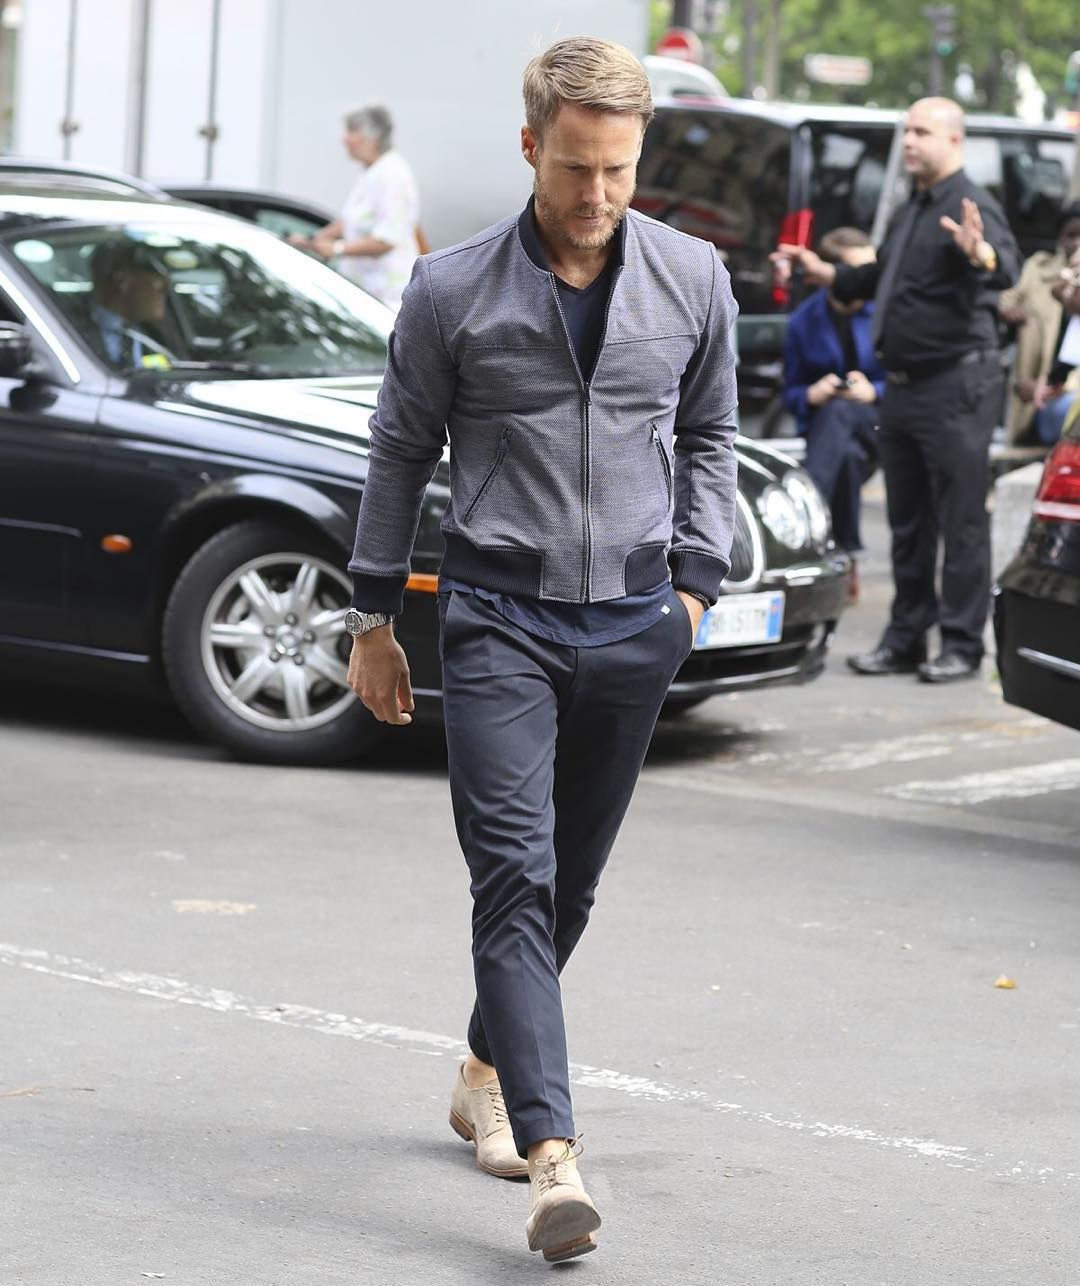 """Los colores grises (en todas sus tonalidades) puedes combinarlas con prendas o zapatos beige o nude.  #ModaparaHombres #Style #LifeStyle #FashionMen…"""